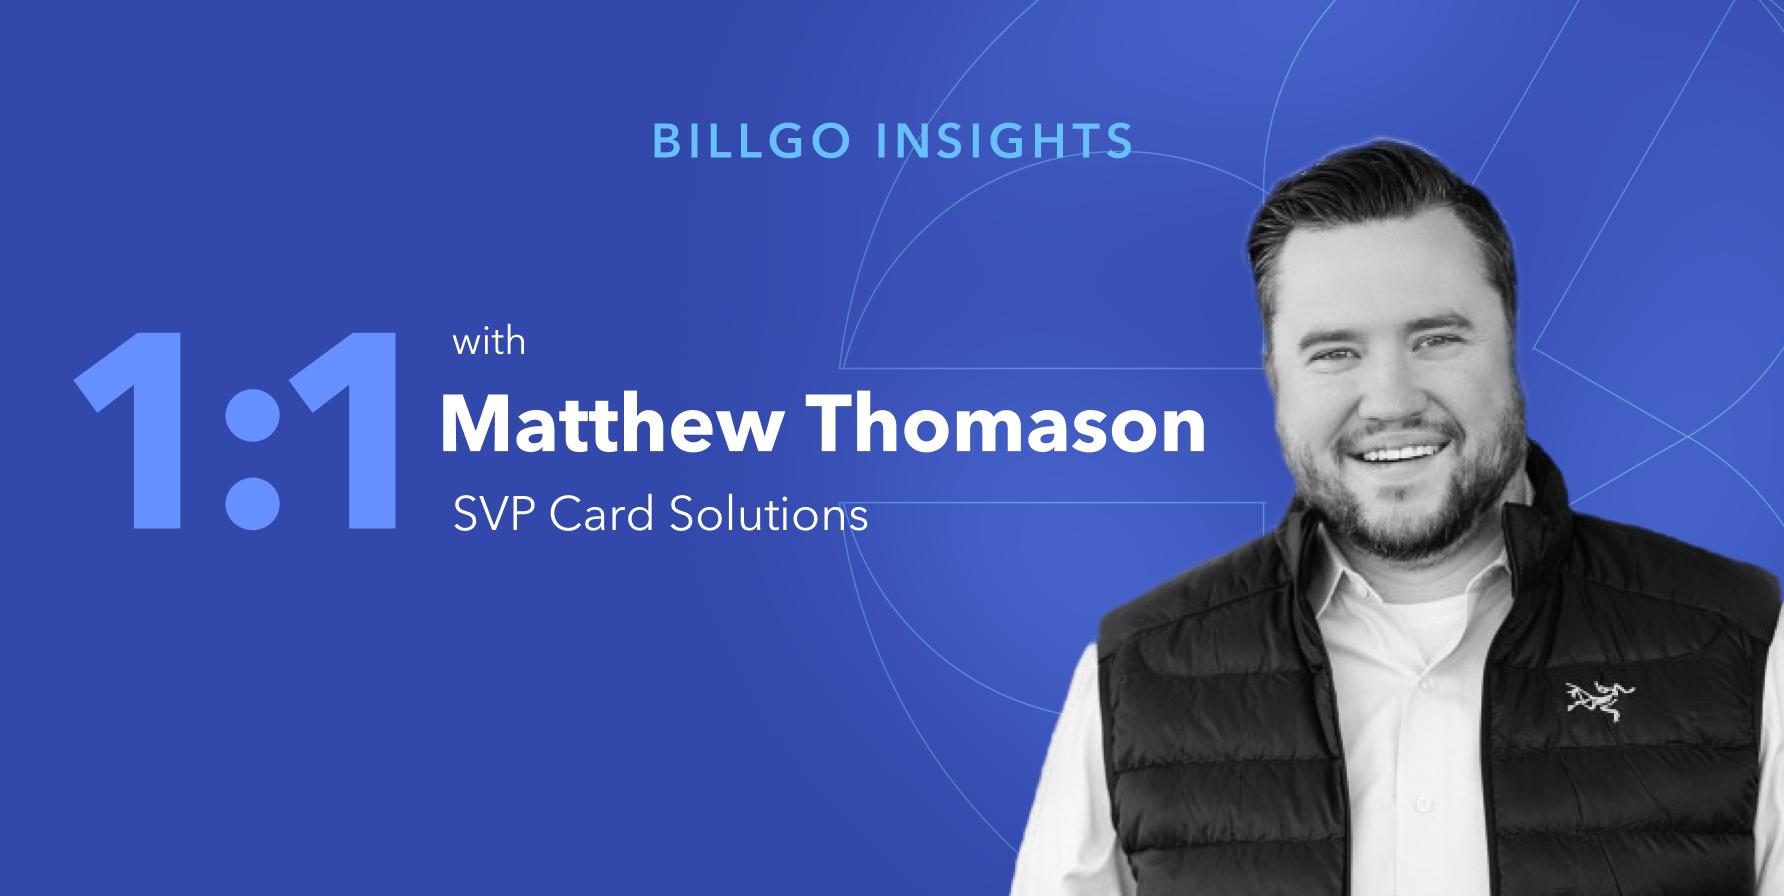 Matthew Thomason discusses BillGO's Intelligent Card Management